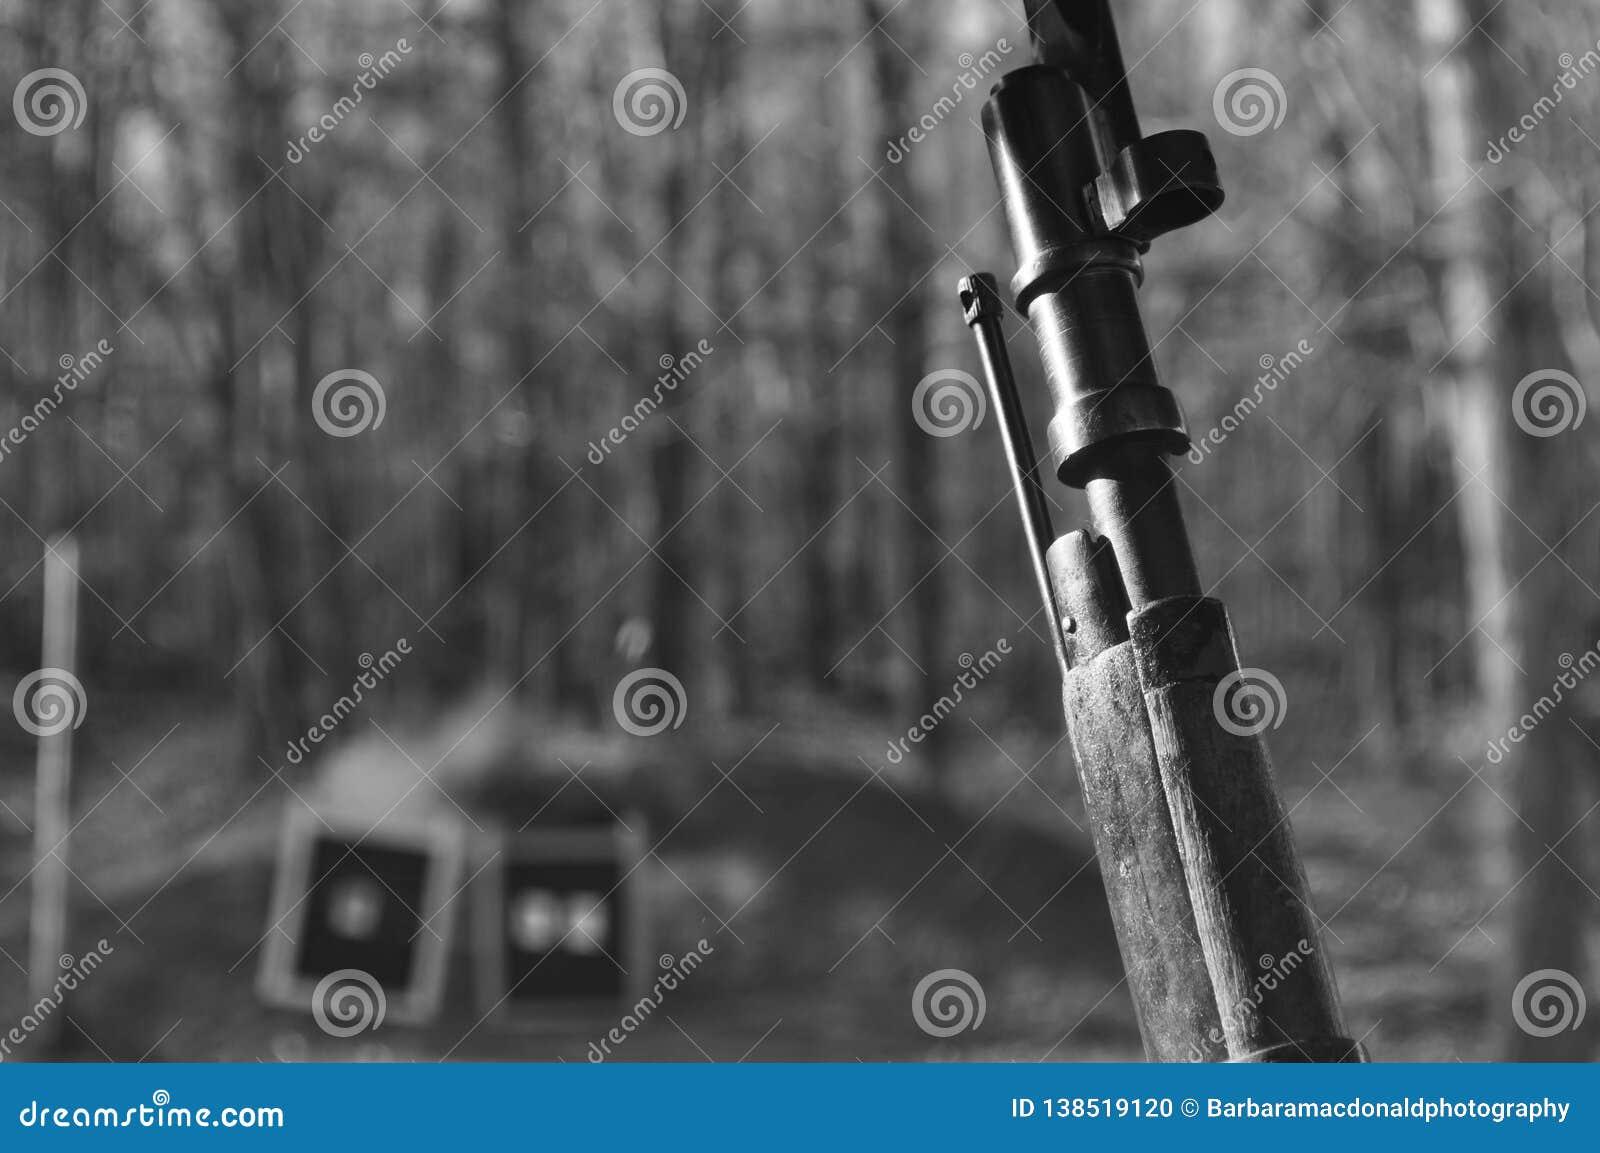 Black And White Mosin Nagant Wood Gun Rifle Stock With